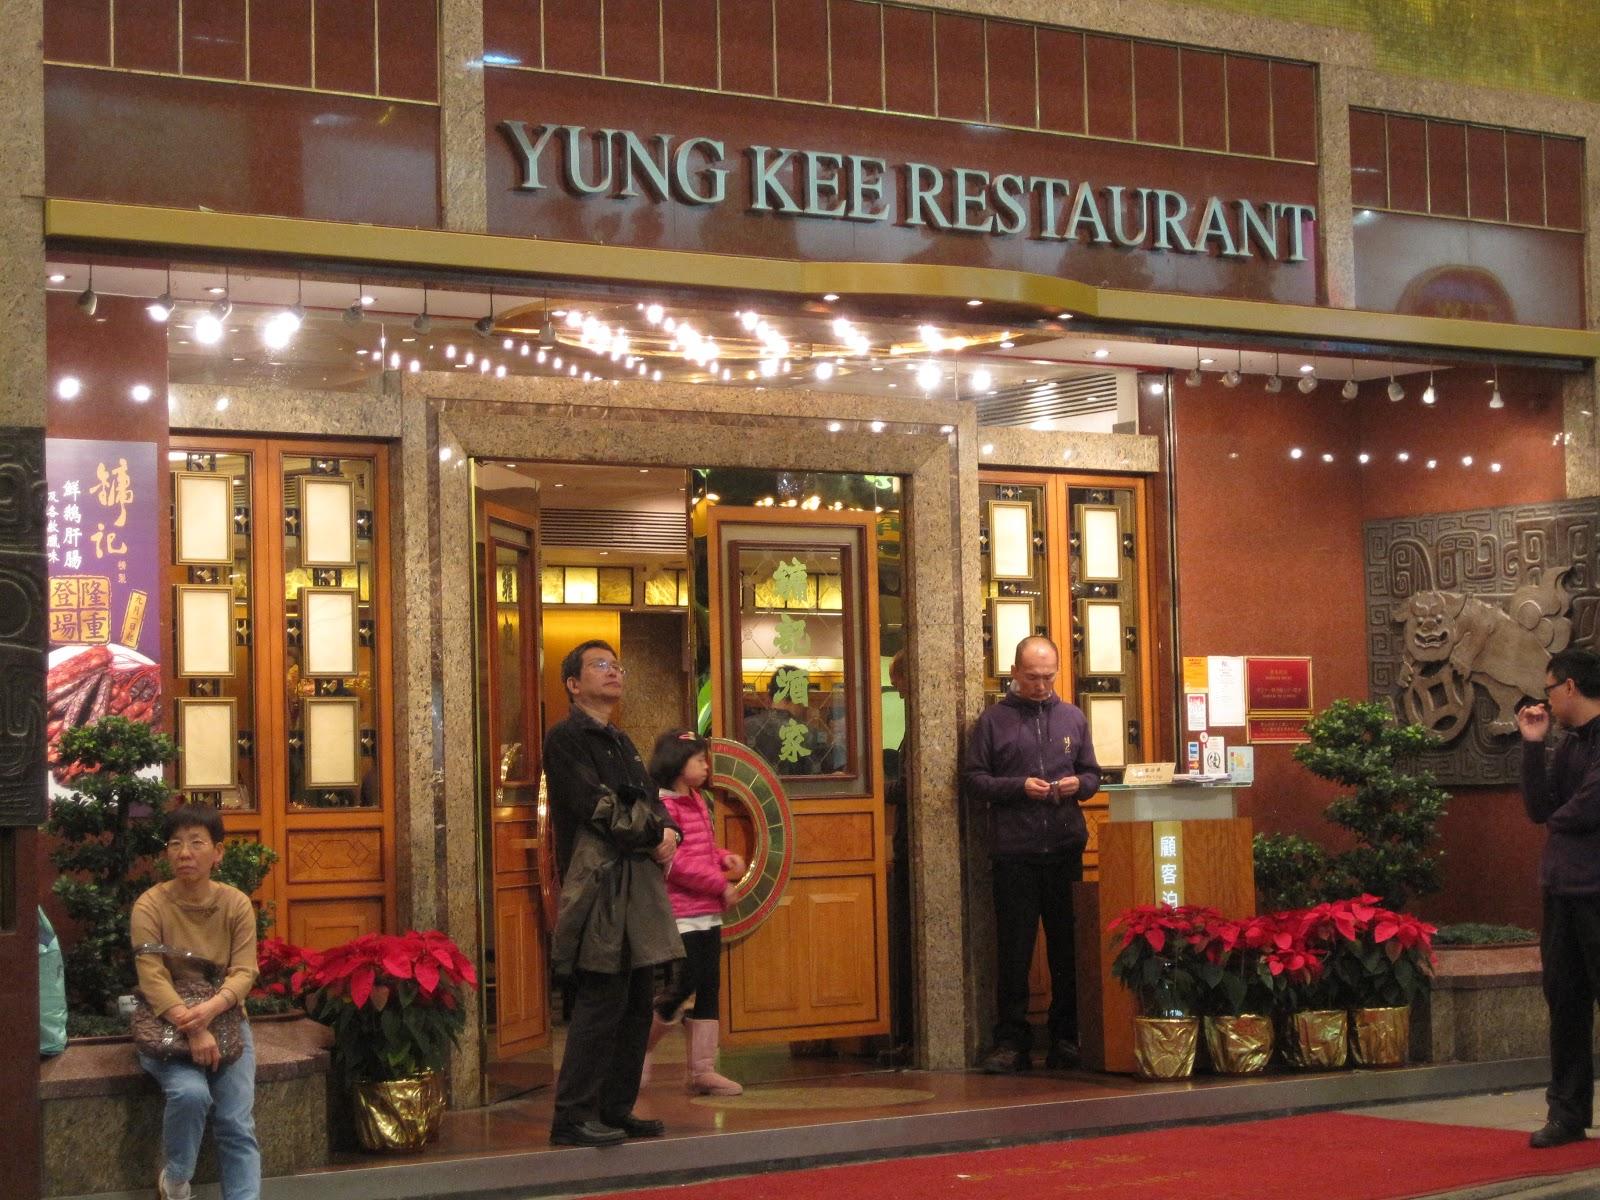 yung kee restaurant hong kong anset2000 blog. Black Bedroom Furniture Sets. Home Design Ideas